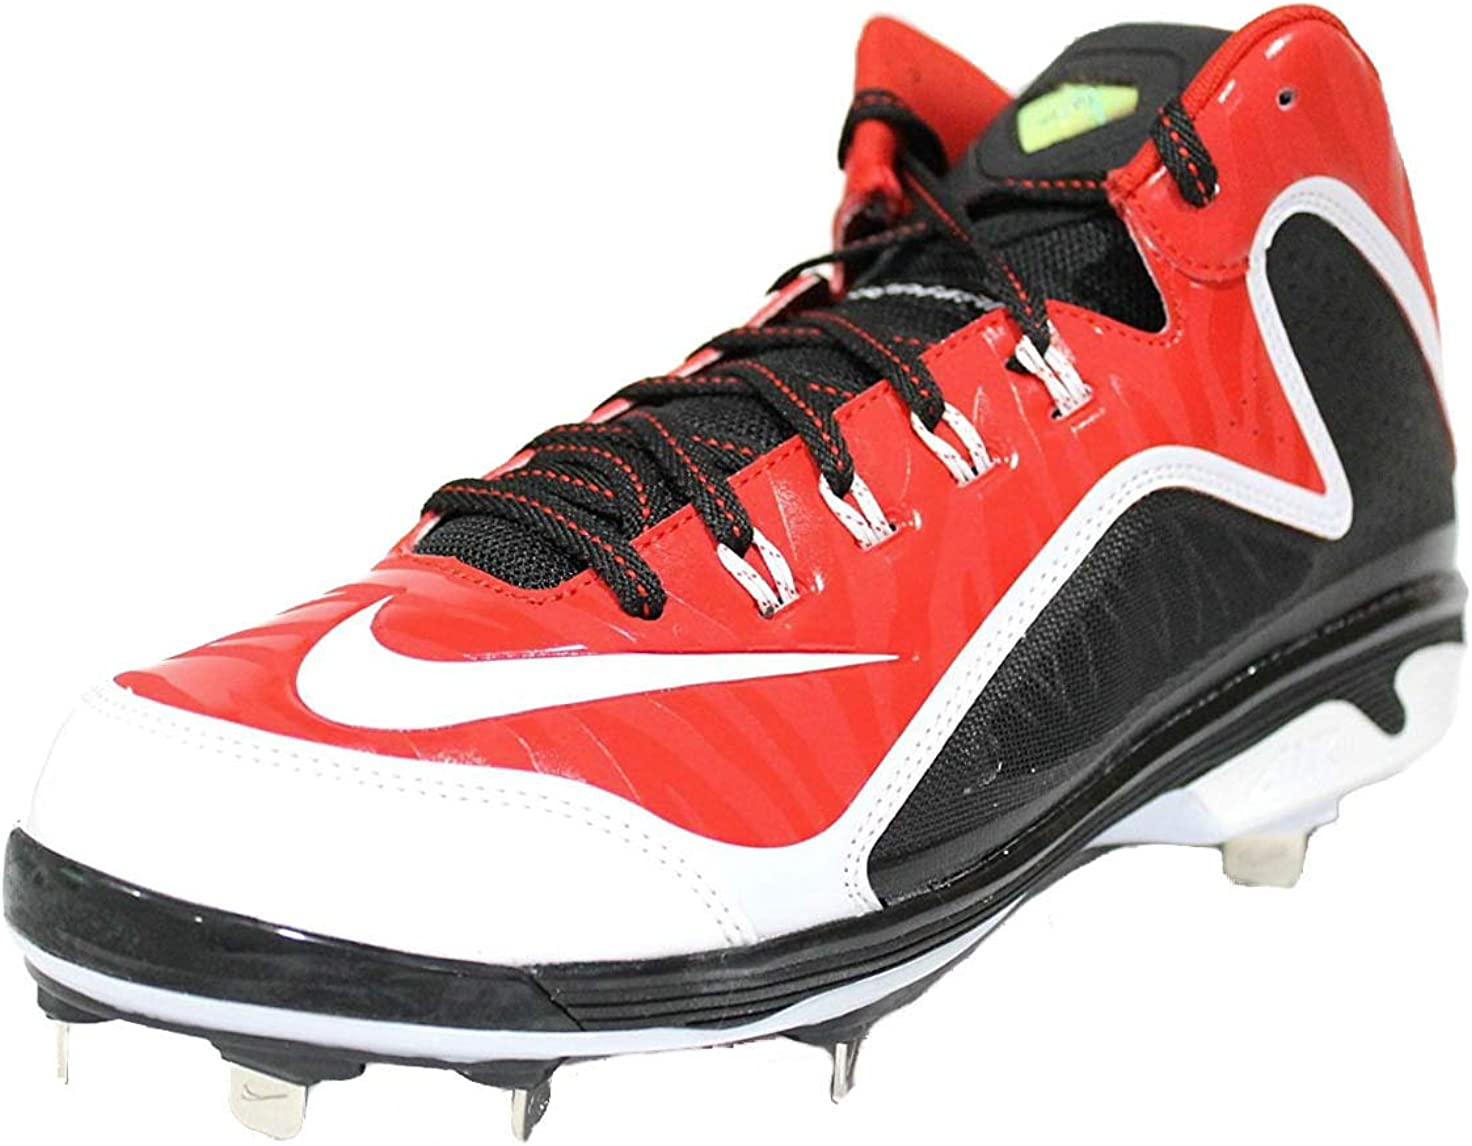 Red/Black Baseball Cleats 616259 610